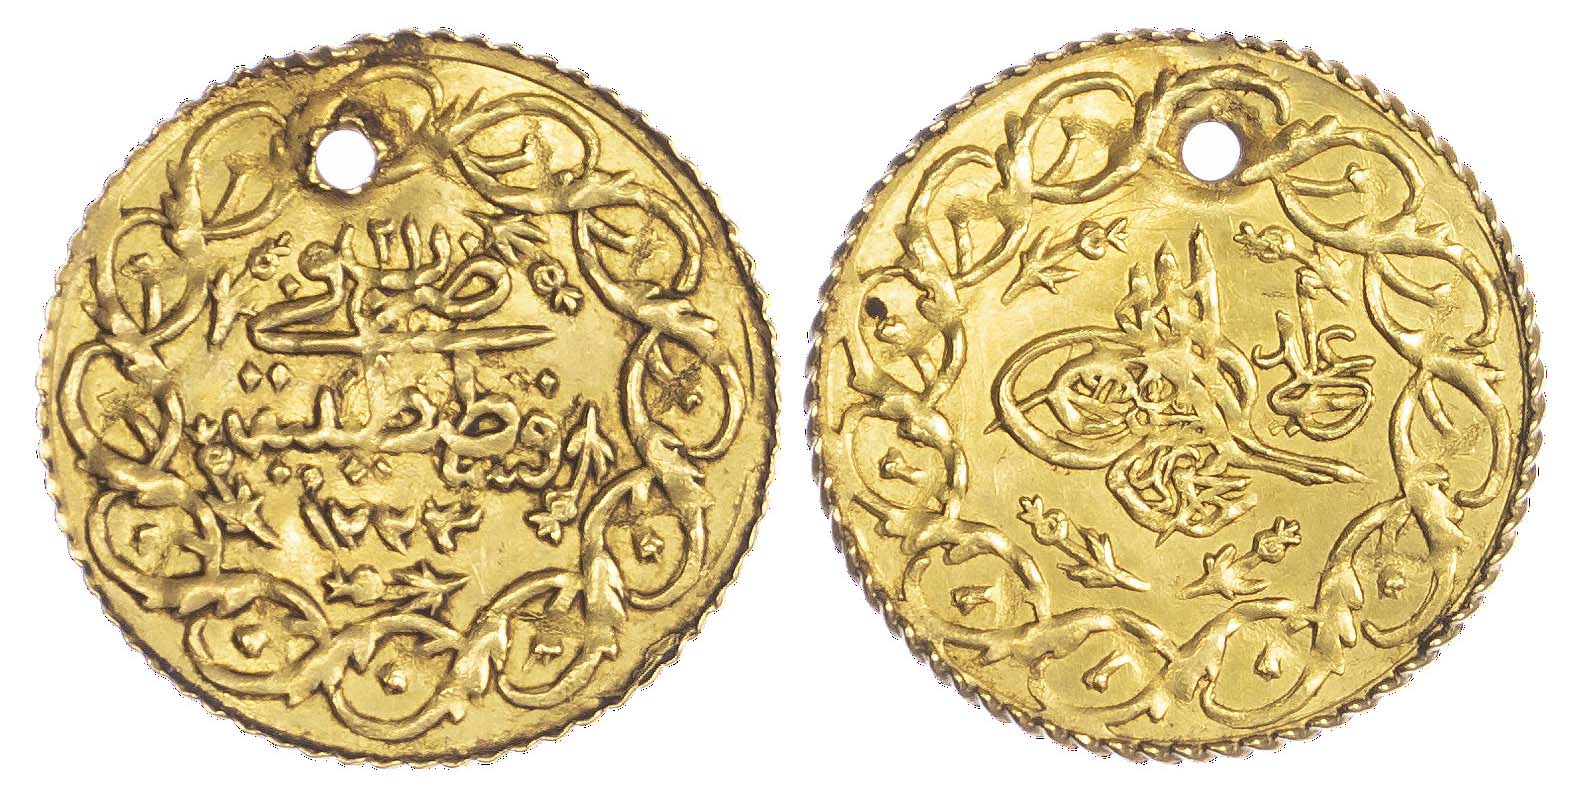 Ottoman Empire, Mahmud II (1808-1839), gold Mahmudiye and gold Cedid Adli Altın - Qustantiniya